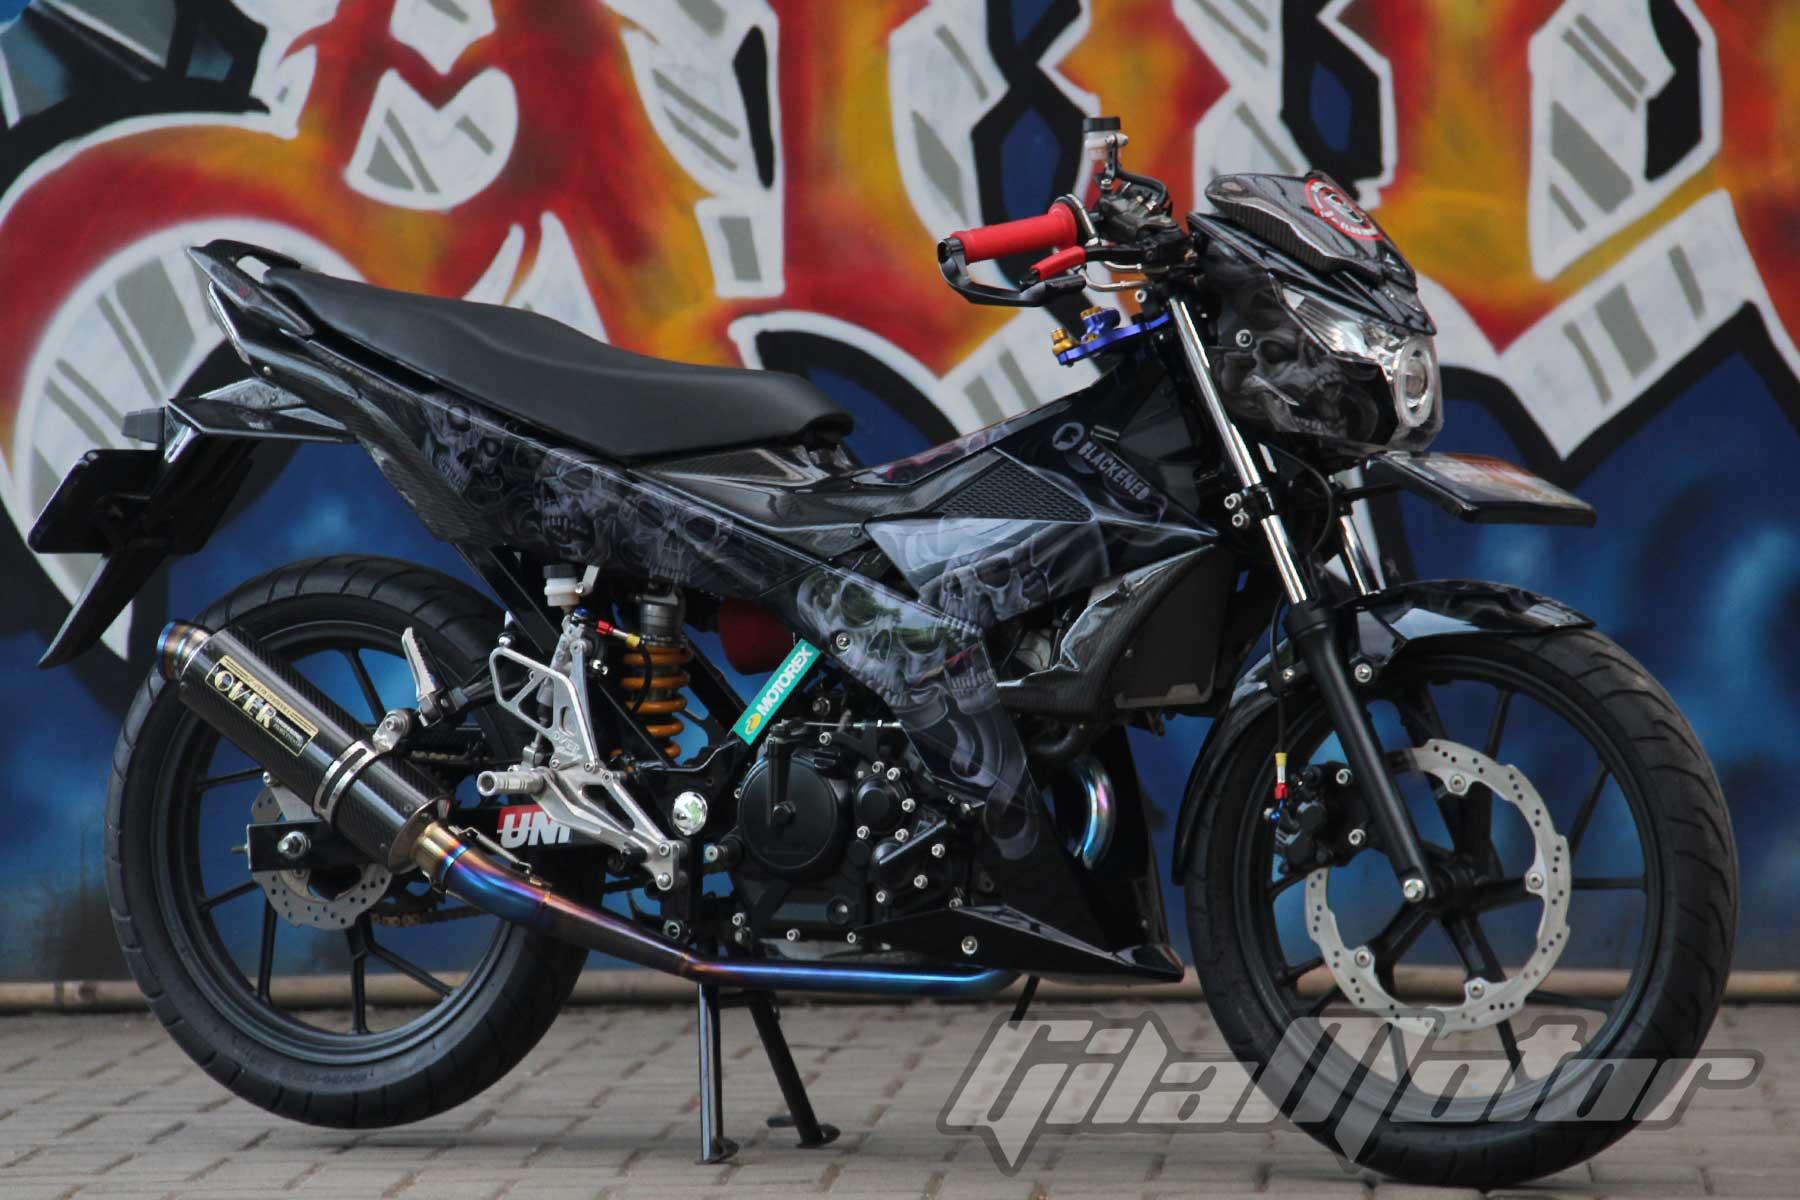 Modifikasi Suzuki Satria F150 Black Predator